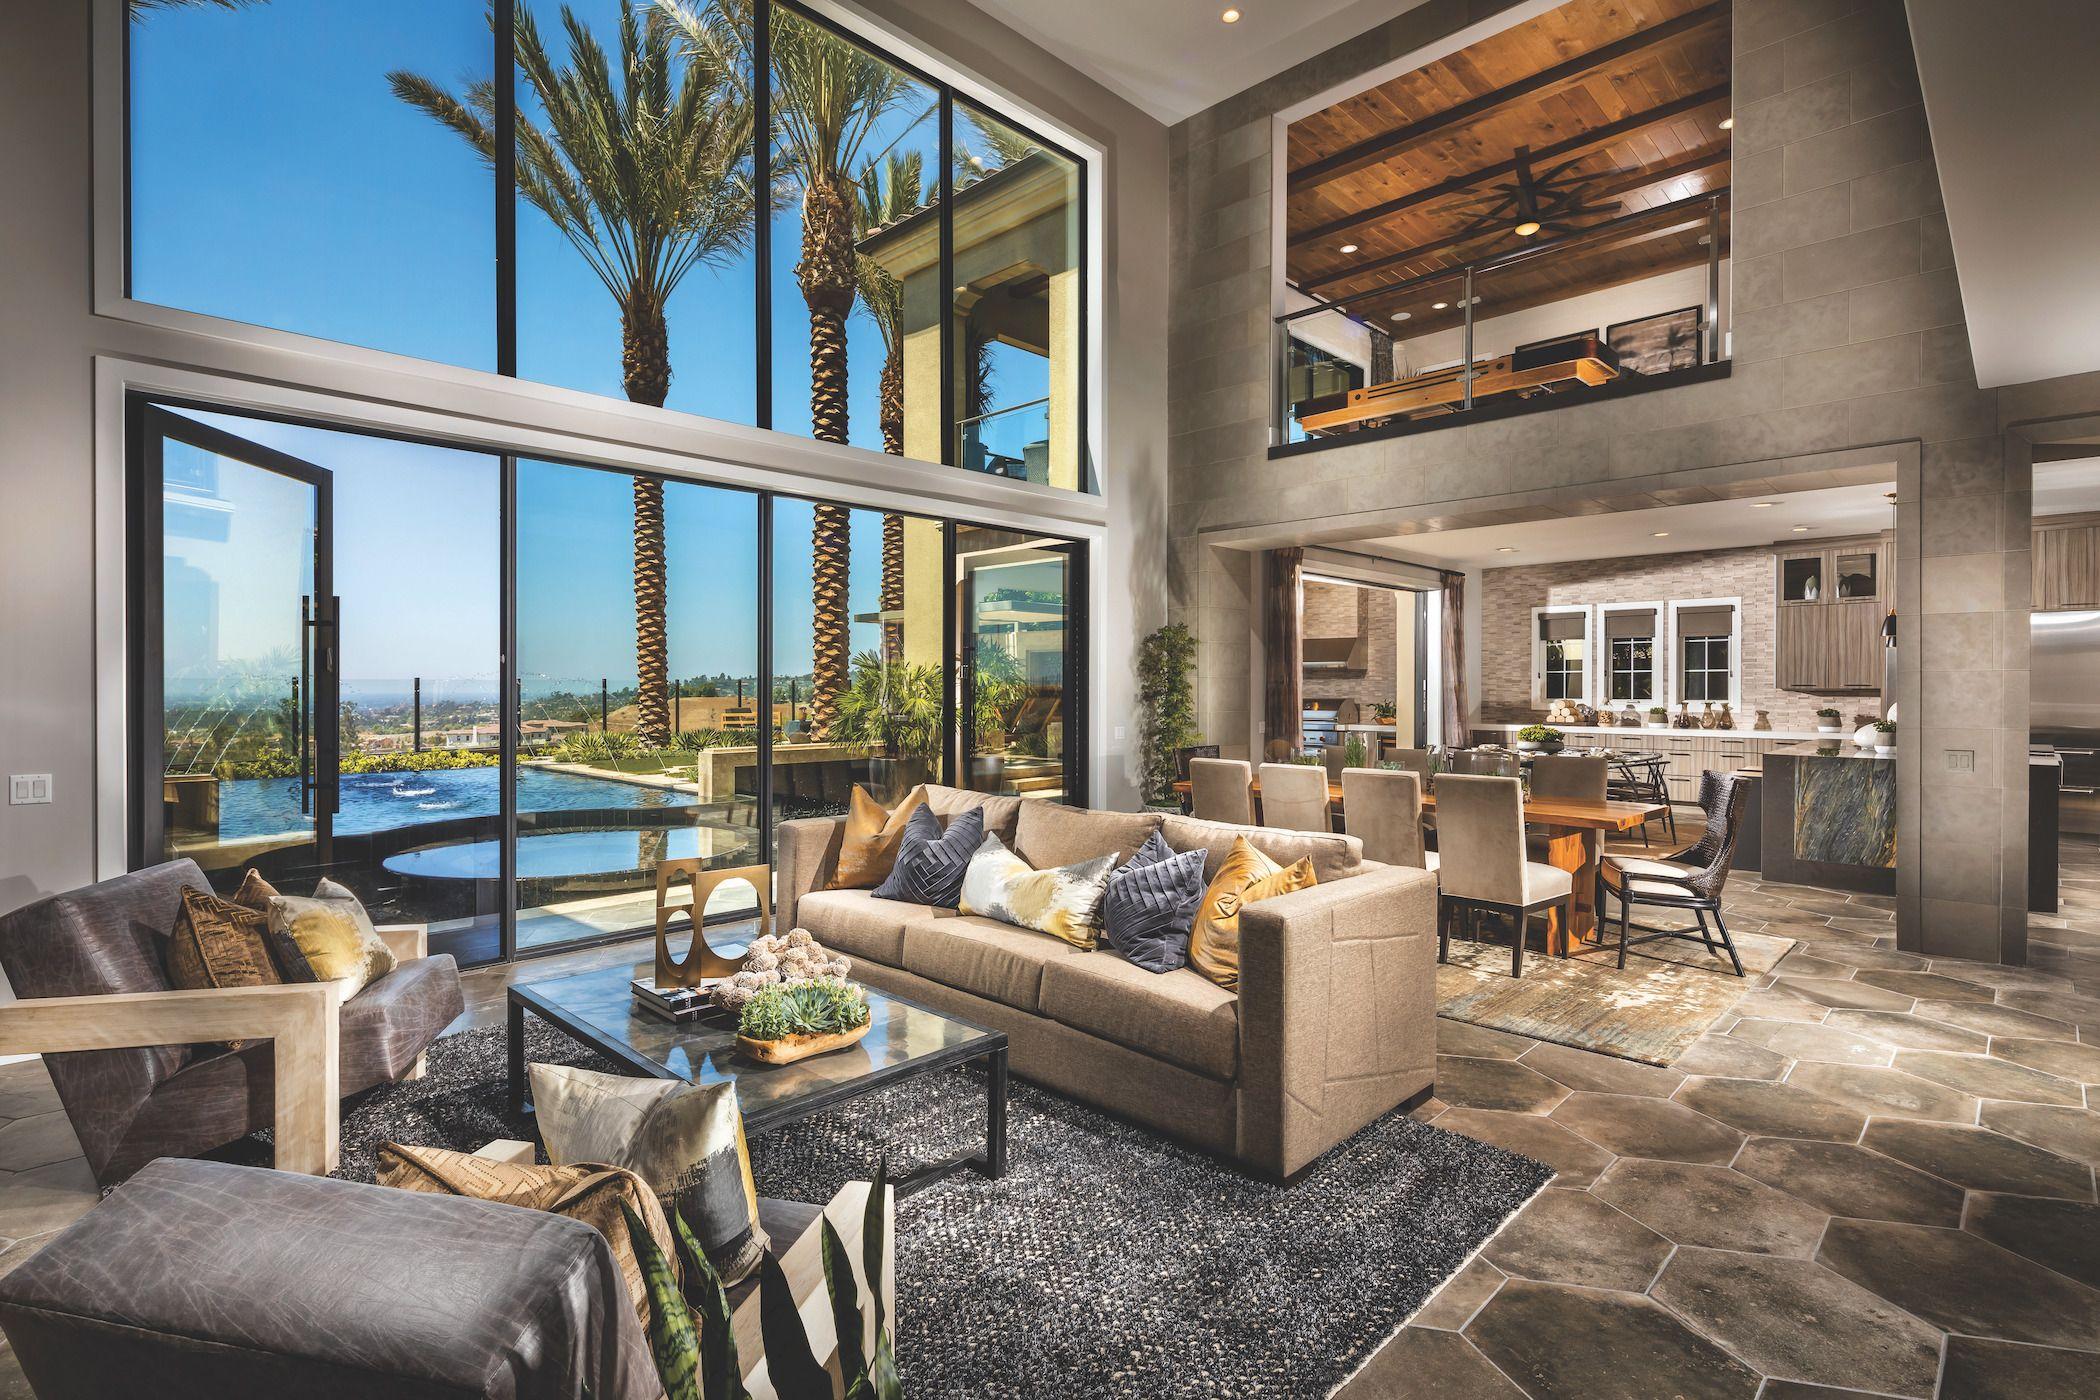 25 Luxury Homes 2018 BestOfToll Properties Across The